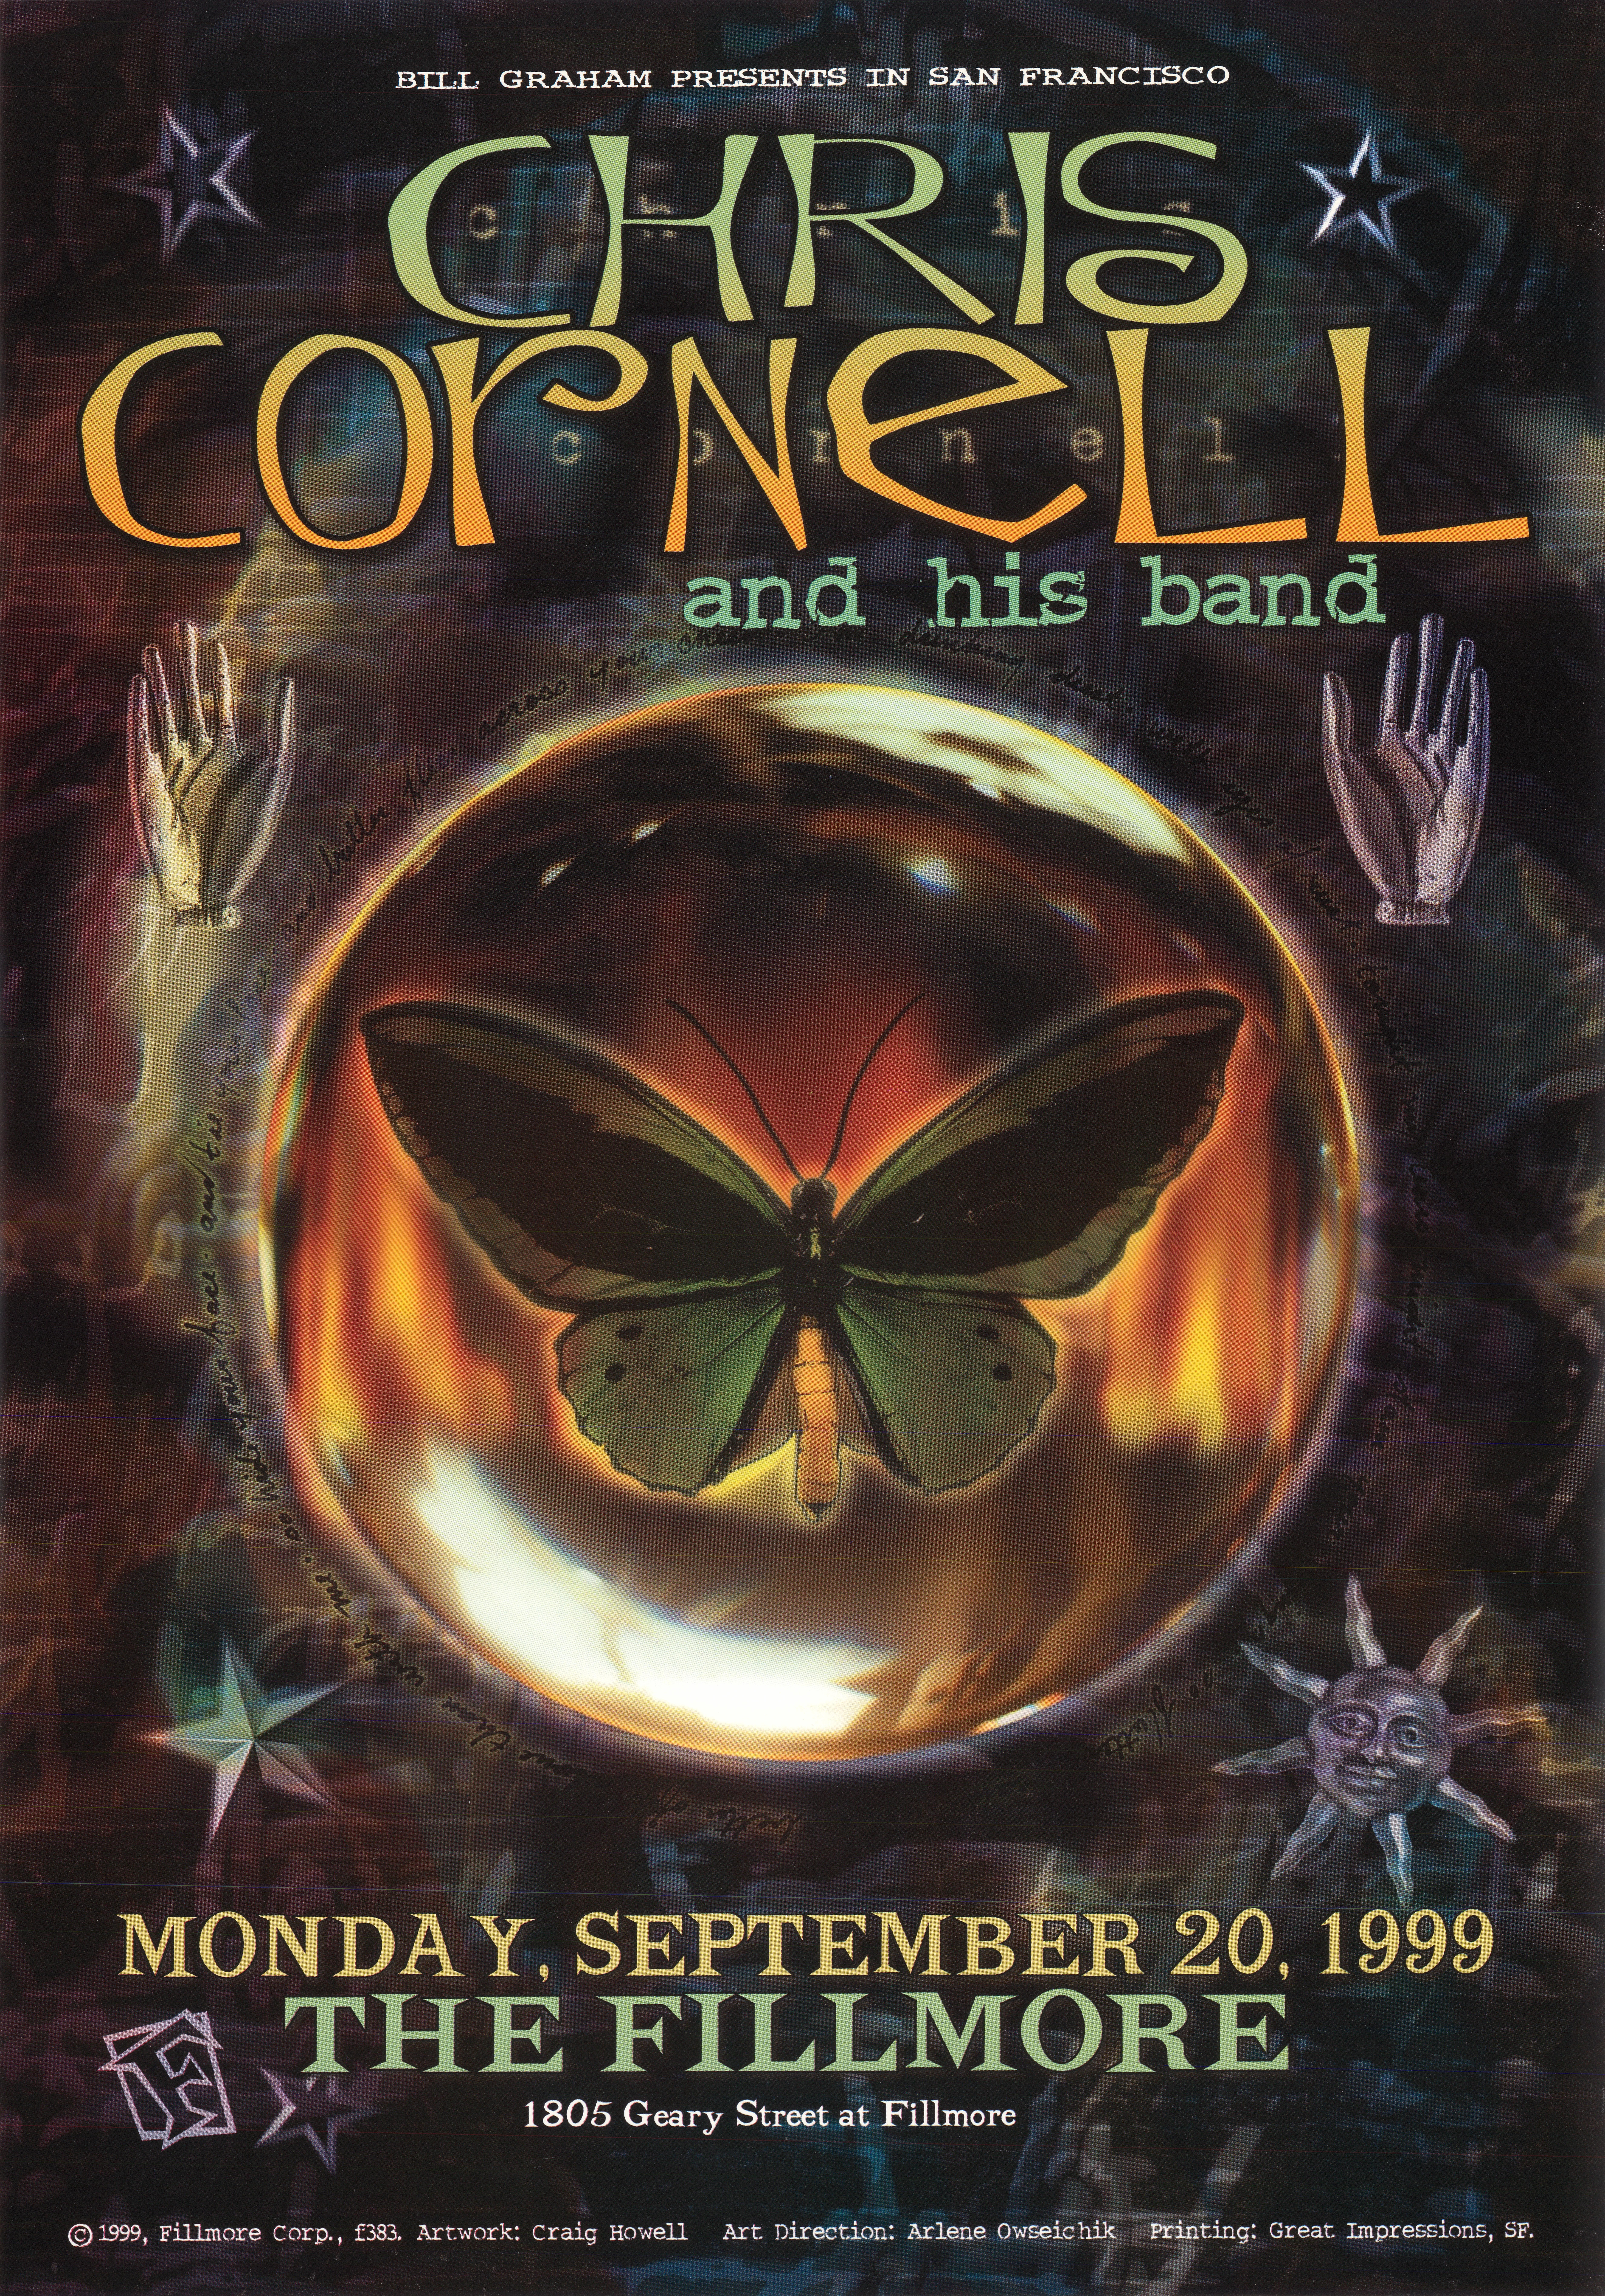 Chris Cornell Poster